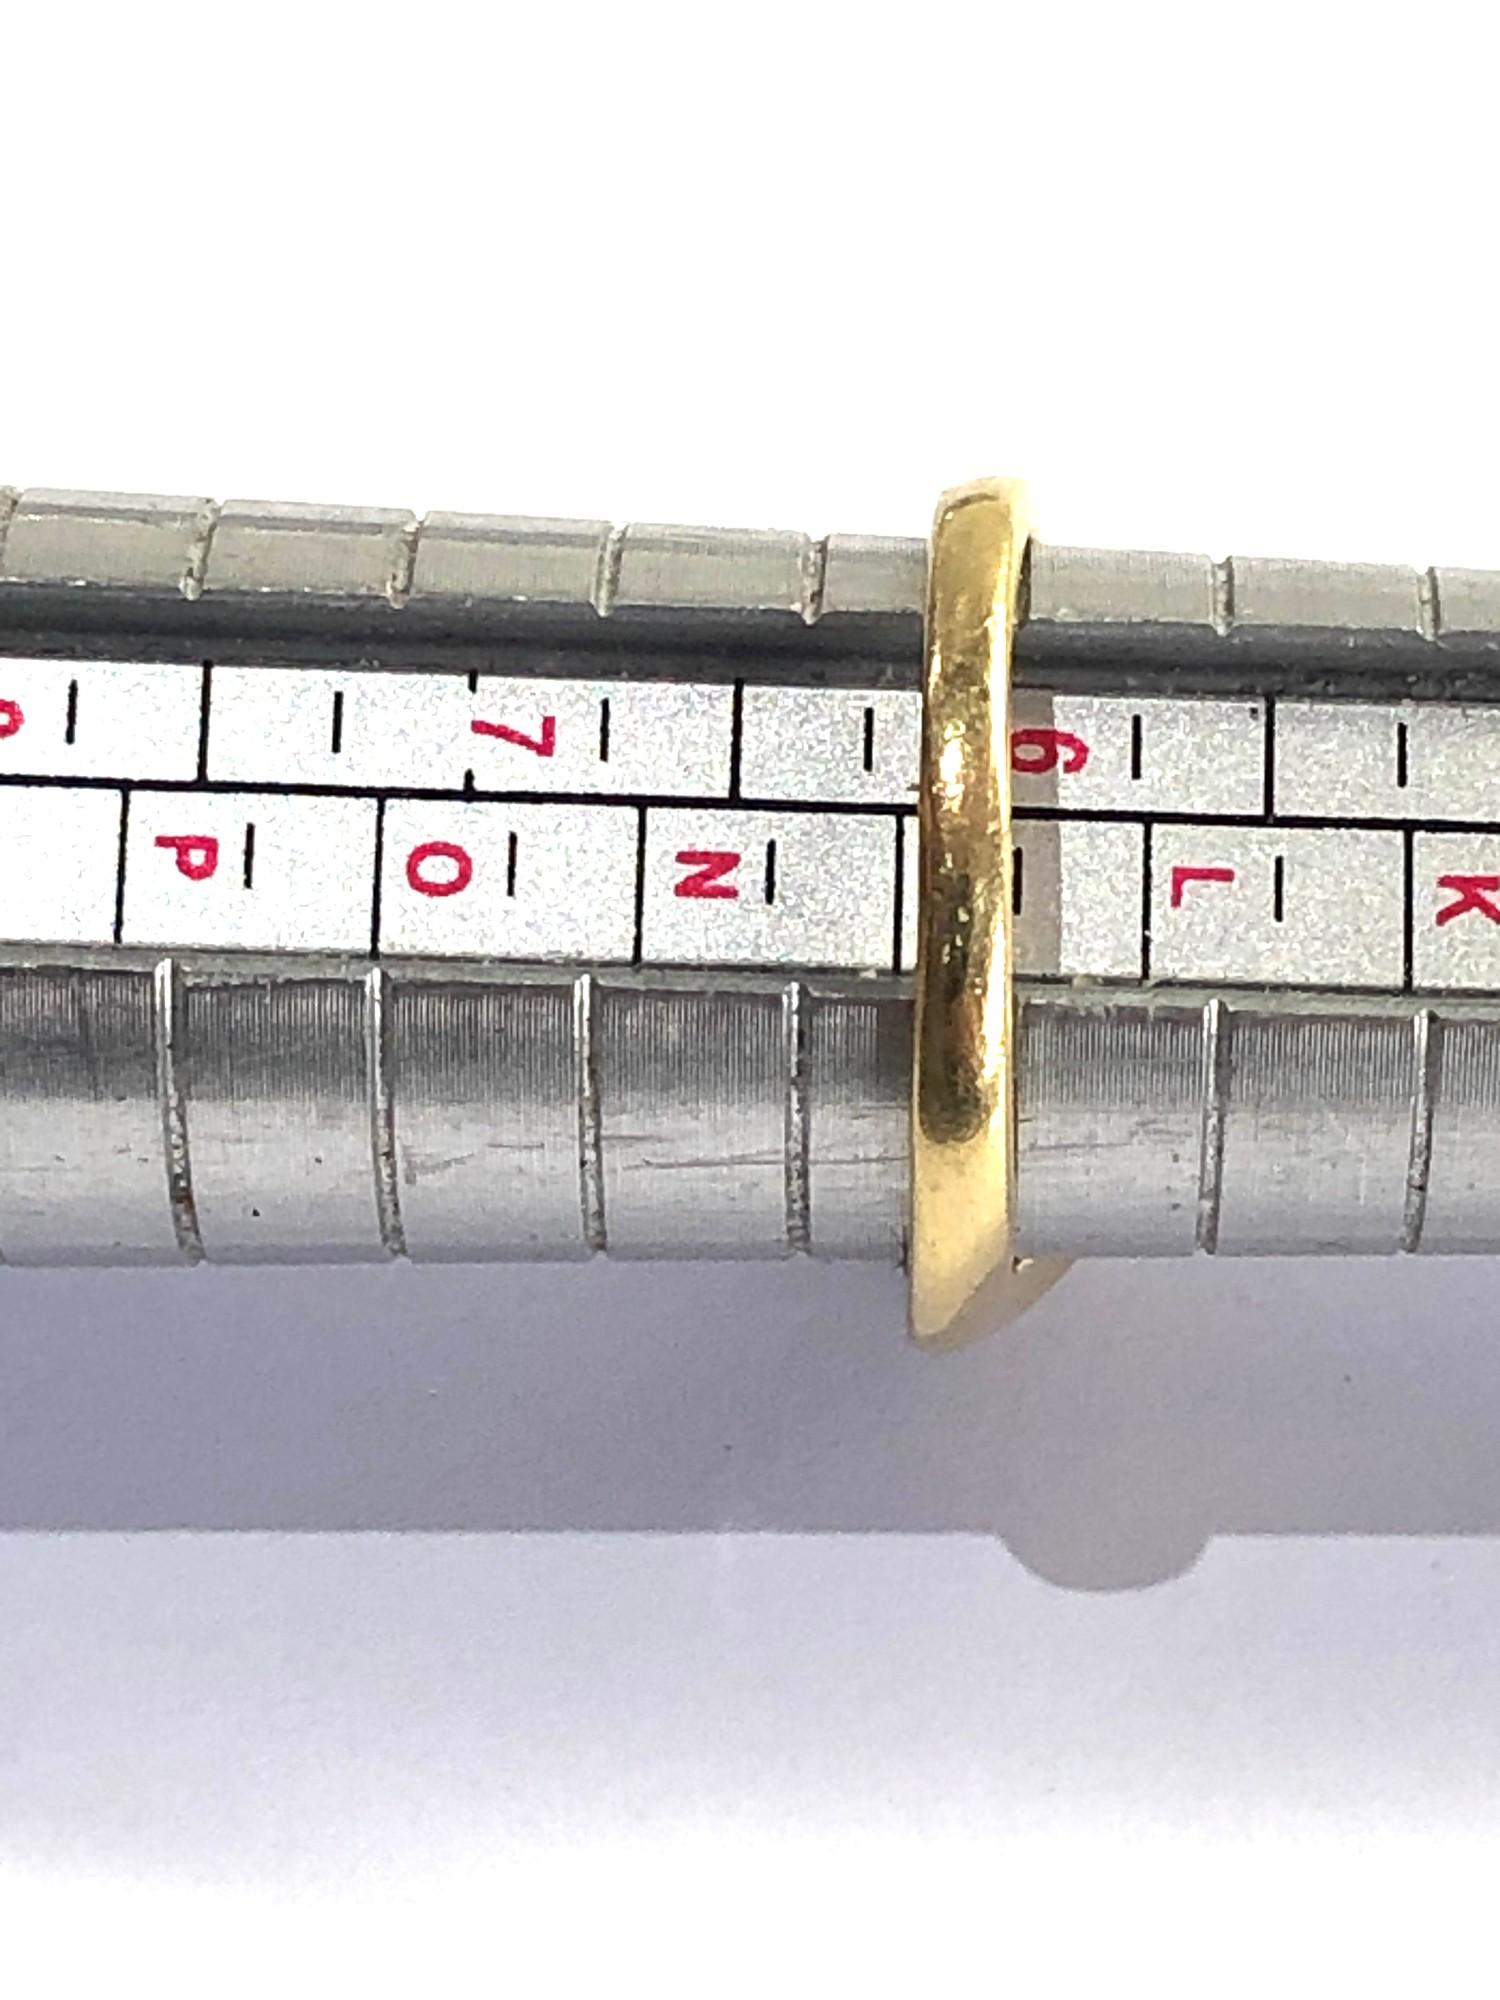 18ct gold diamond ring 0.25ct diamonds weight 4.3g - Image 4 of 4